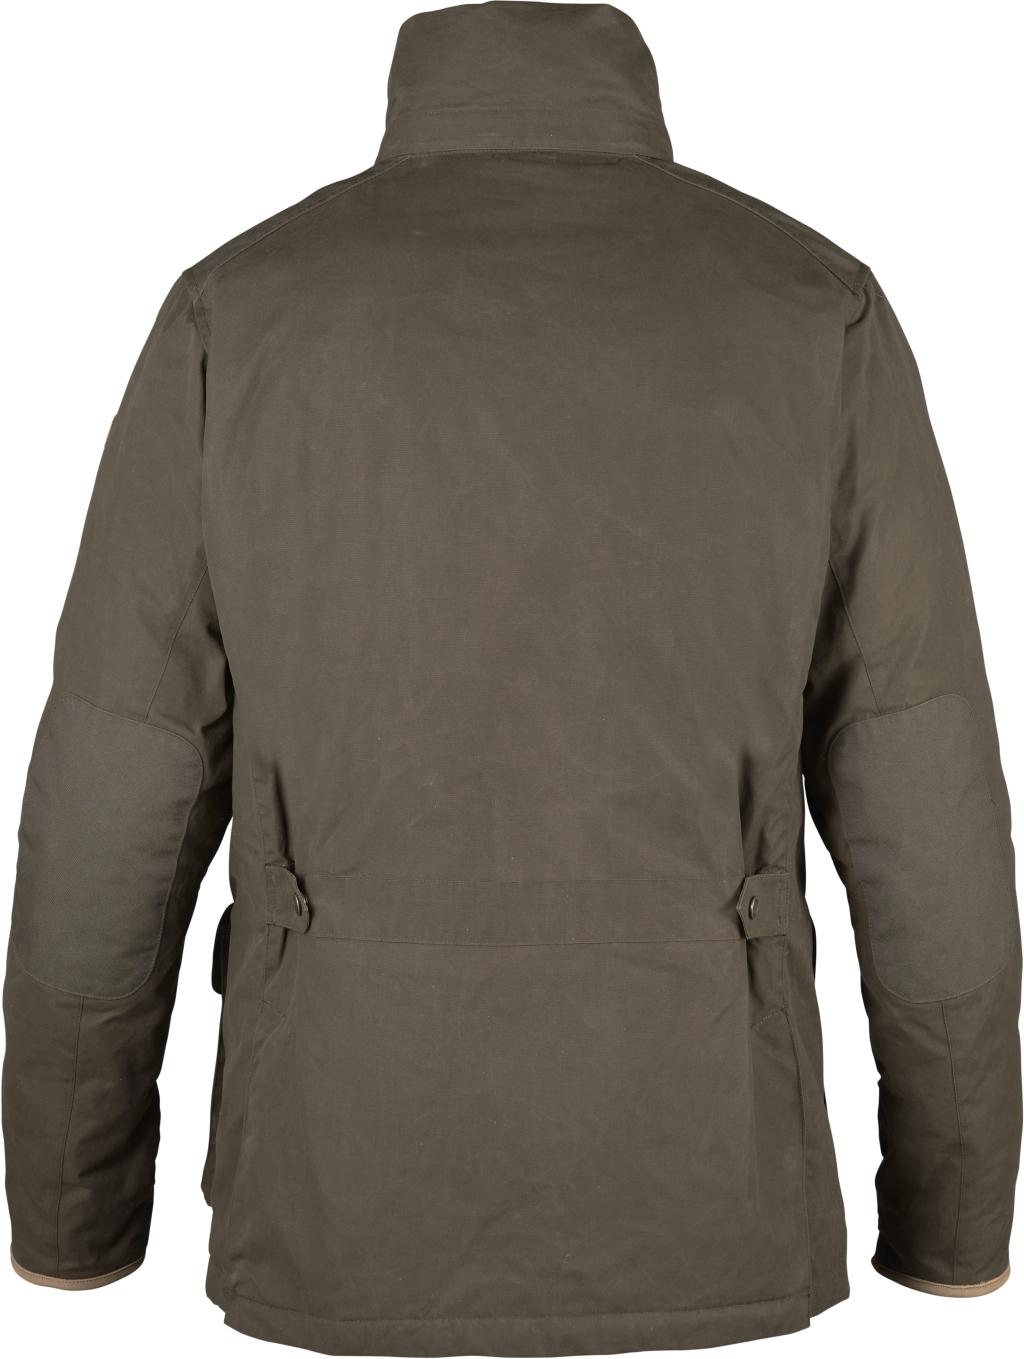 FjallRaven Sormland Padded Jacket Dark Olive-30